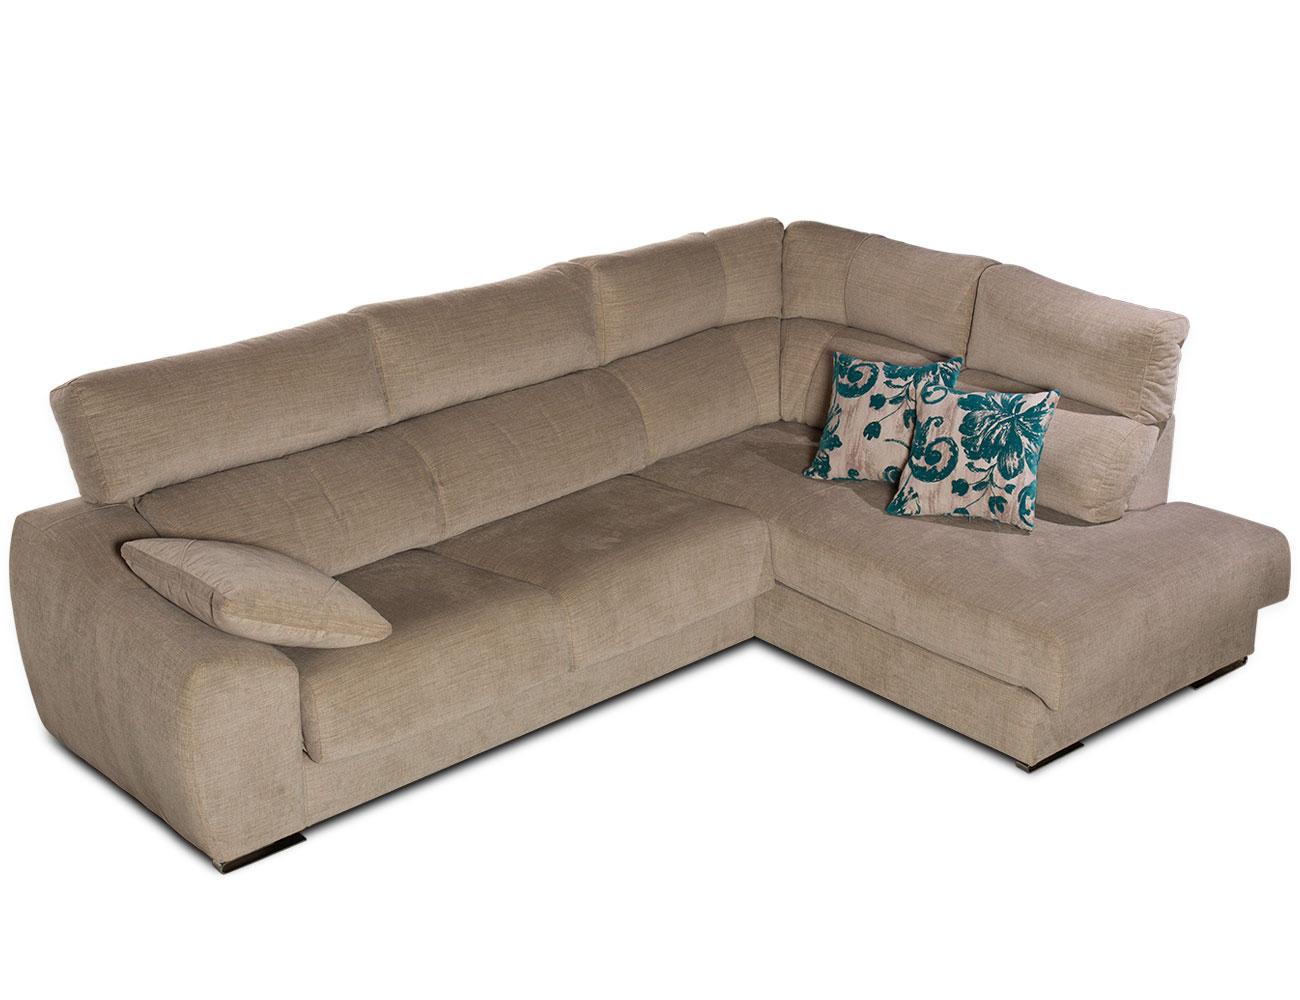 Sofa chaiselongue rincon moderno1